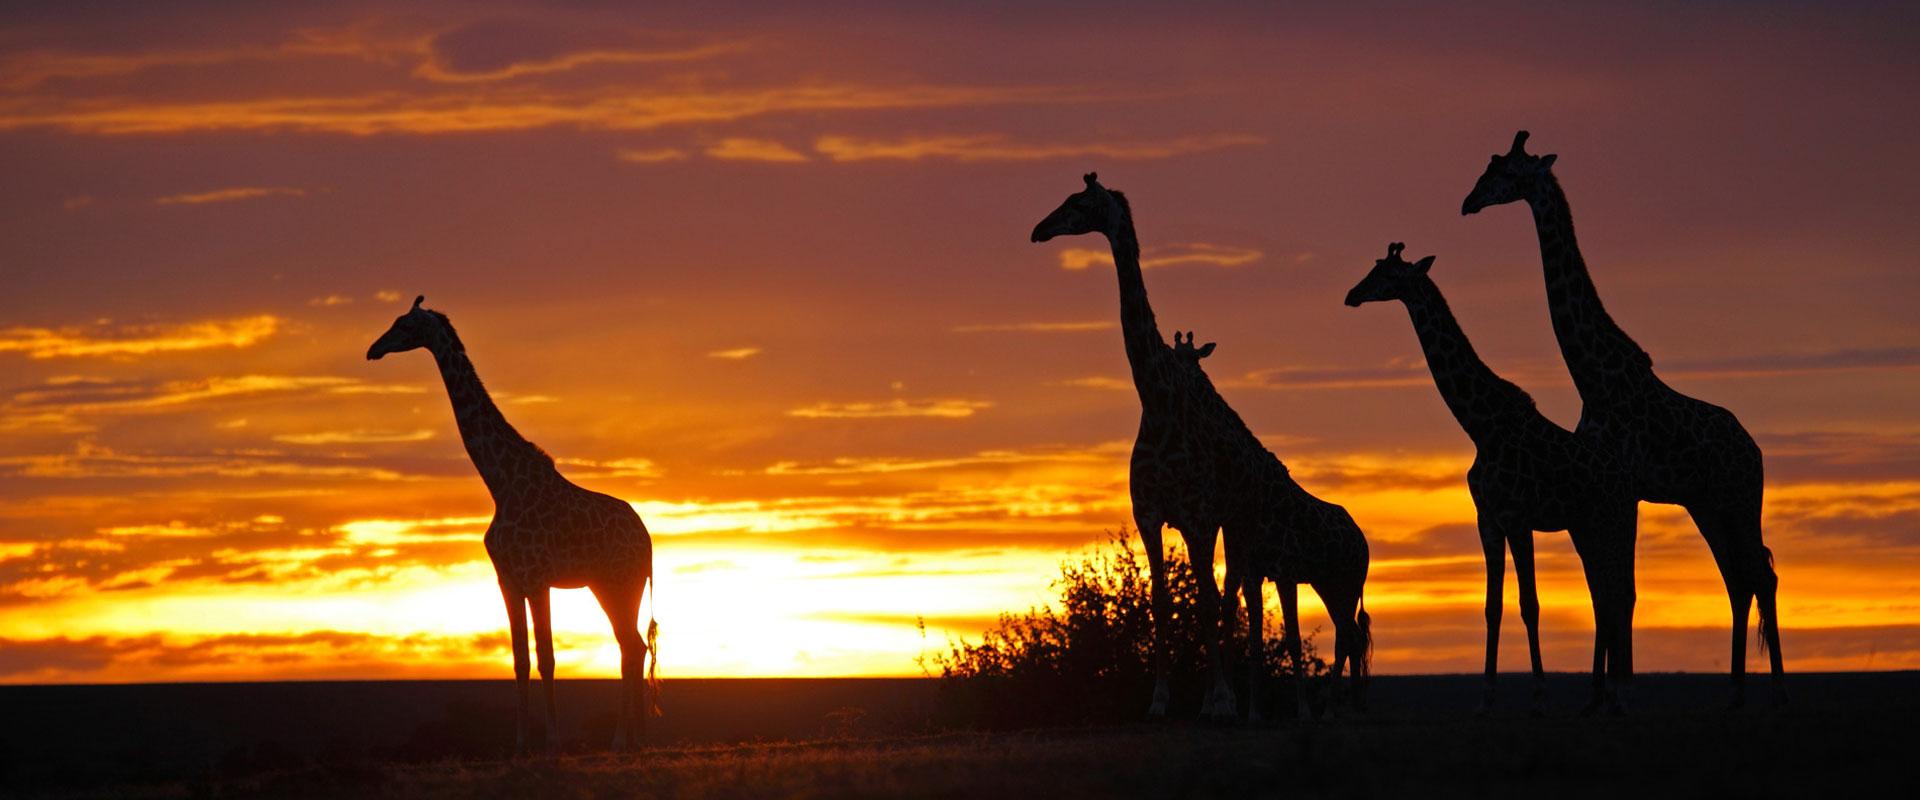 Tanzania Classic Safari